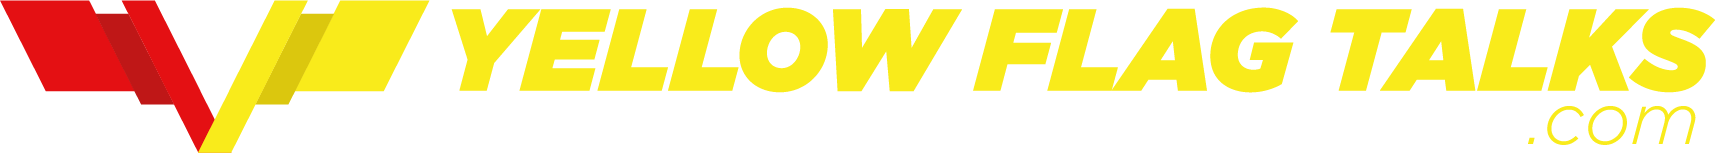 Yellow Flag Talks